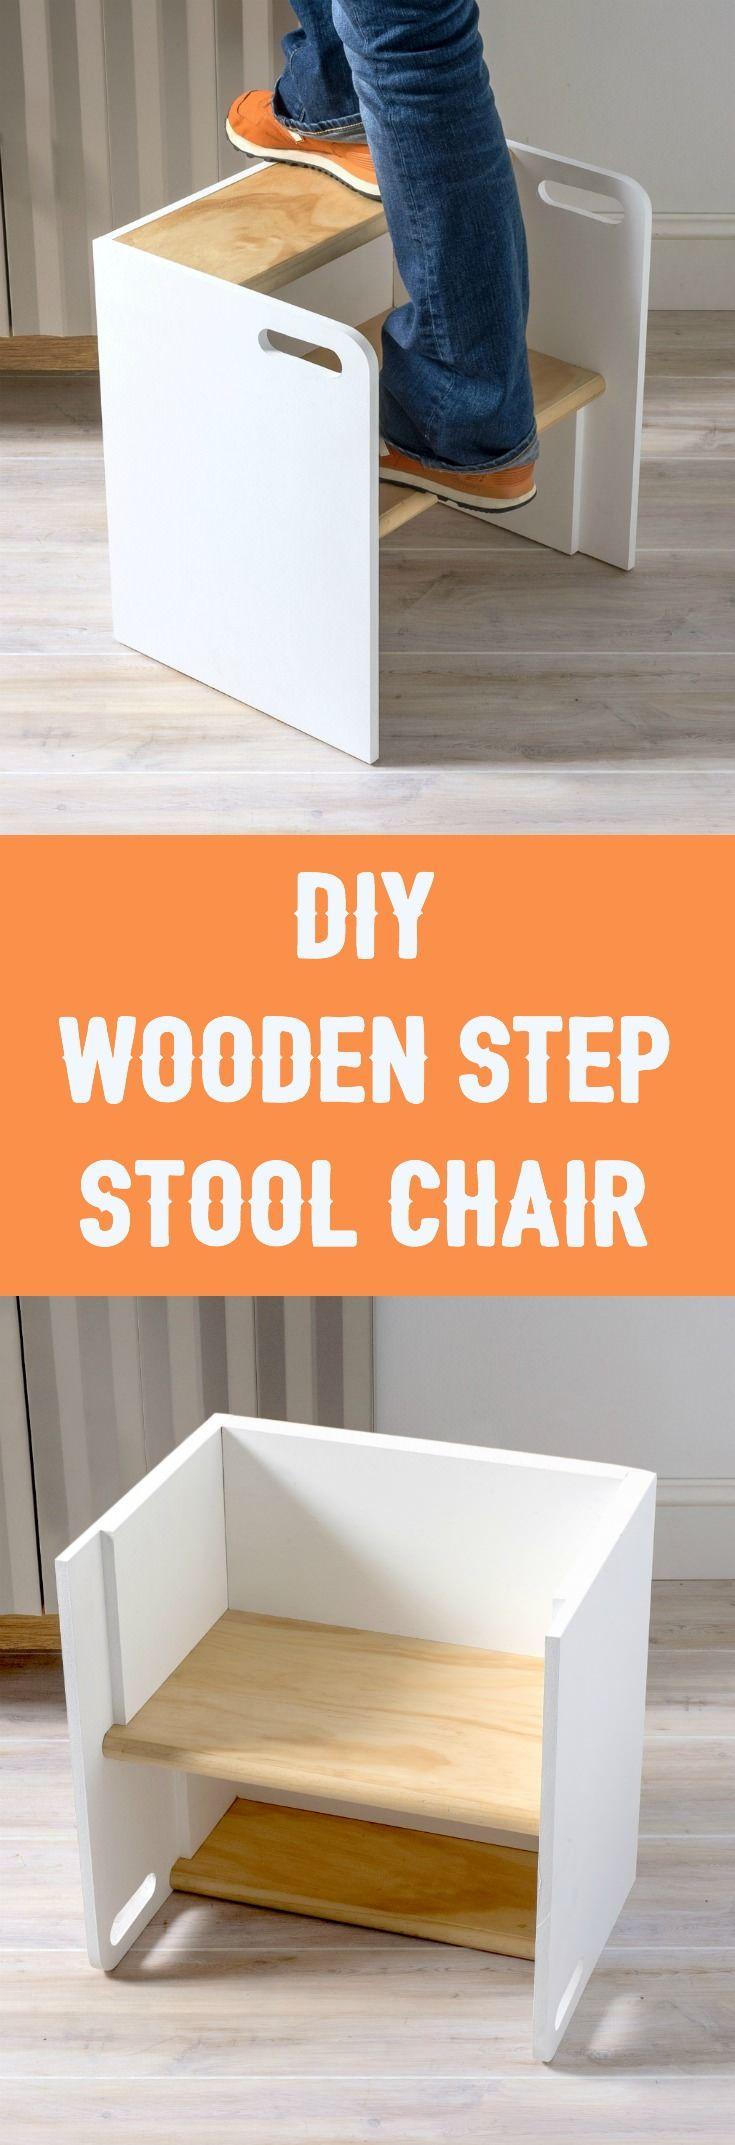 Porches decks patios delta c construction inc - Diy Wooden Step Stool Chair